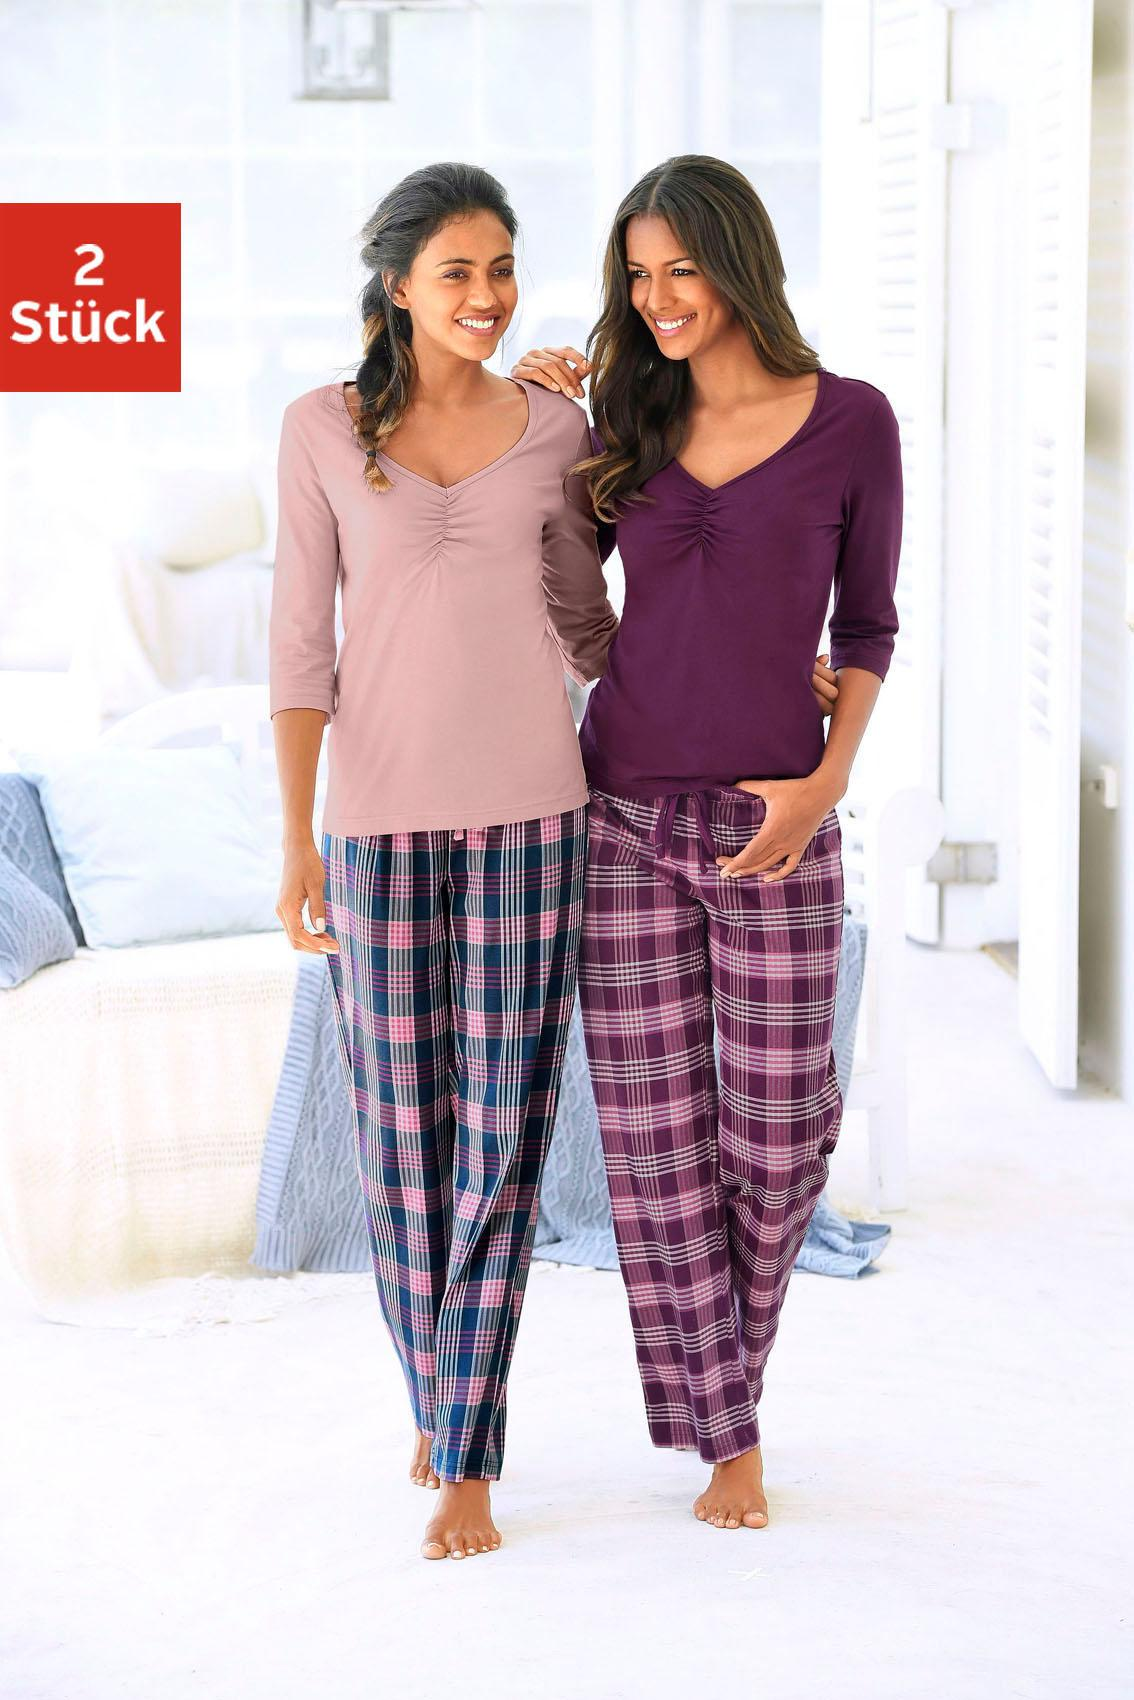 PETITE FLEUR Pyjama (2 Stück)